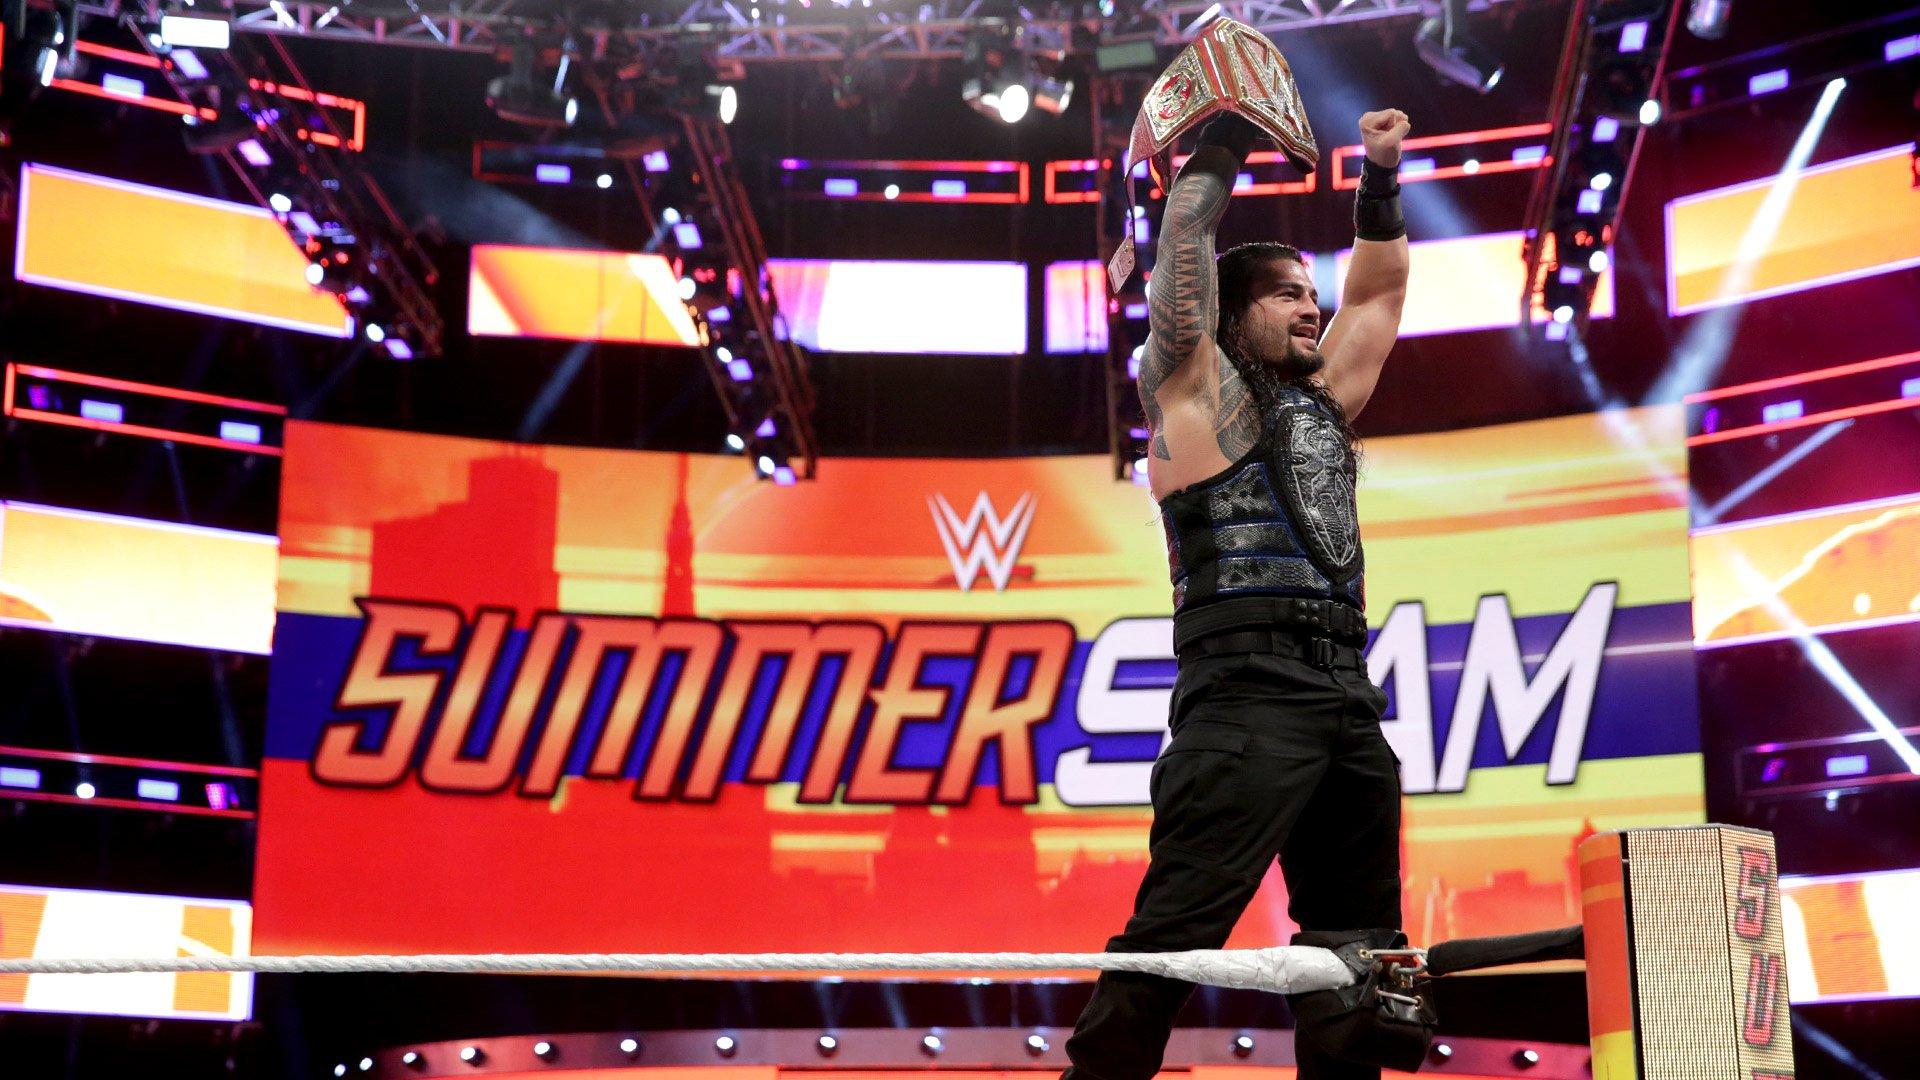 WWE Summerslam 2018 Review 08/19/2018